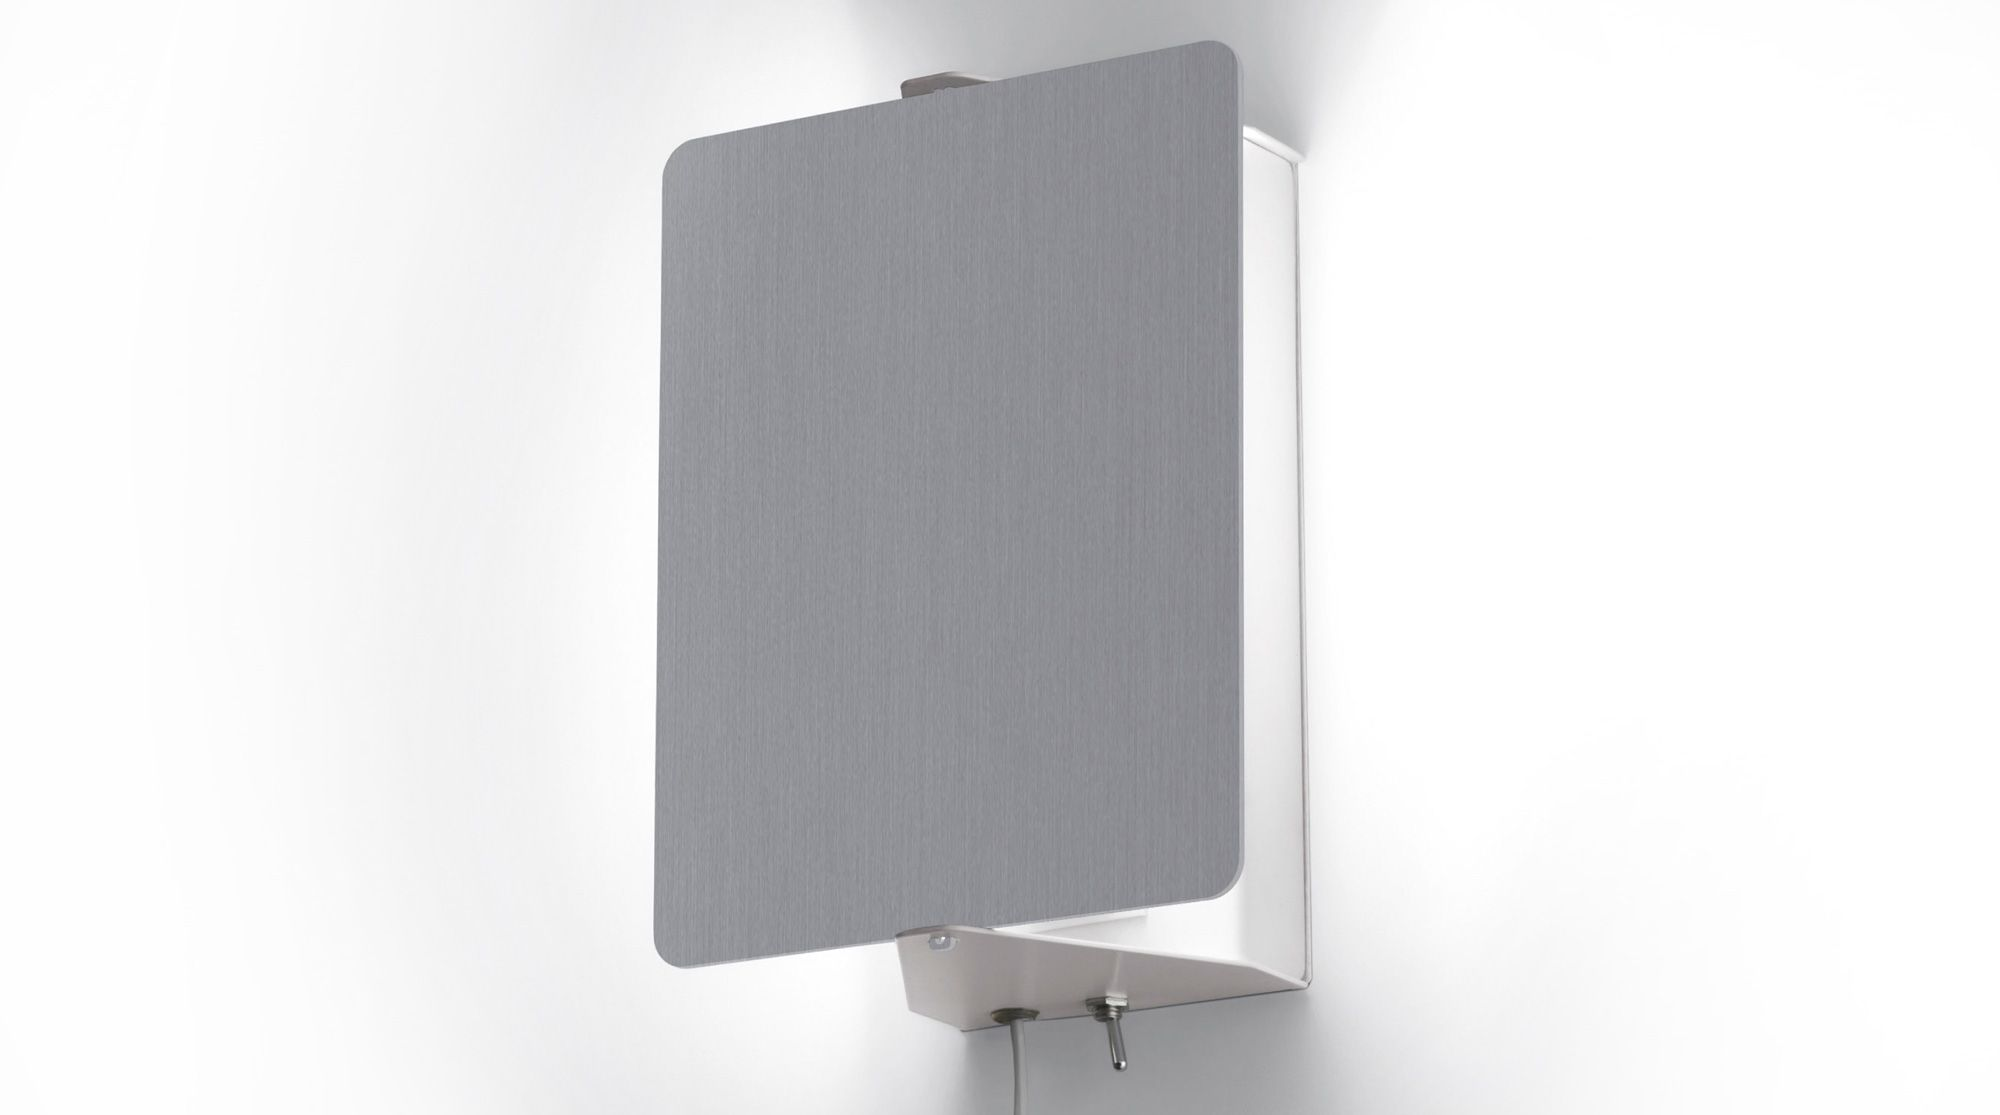 Illuminazione a parete Nemo-Cassina Applique à volet pivotant  #rifarecasa #maistatocosifacile grazie a #designbox & #designcard #idfsrl